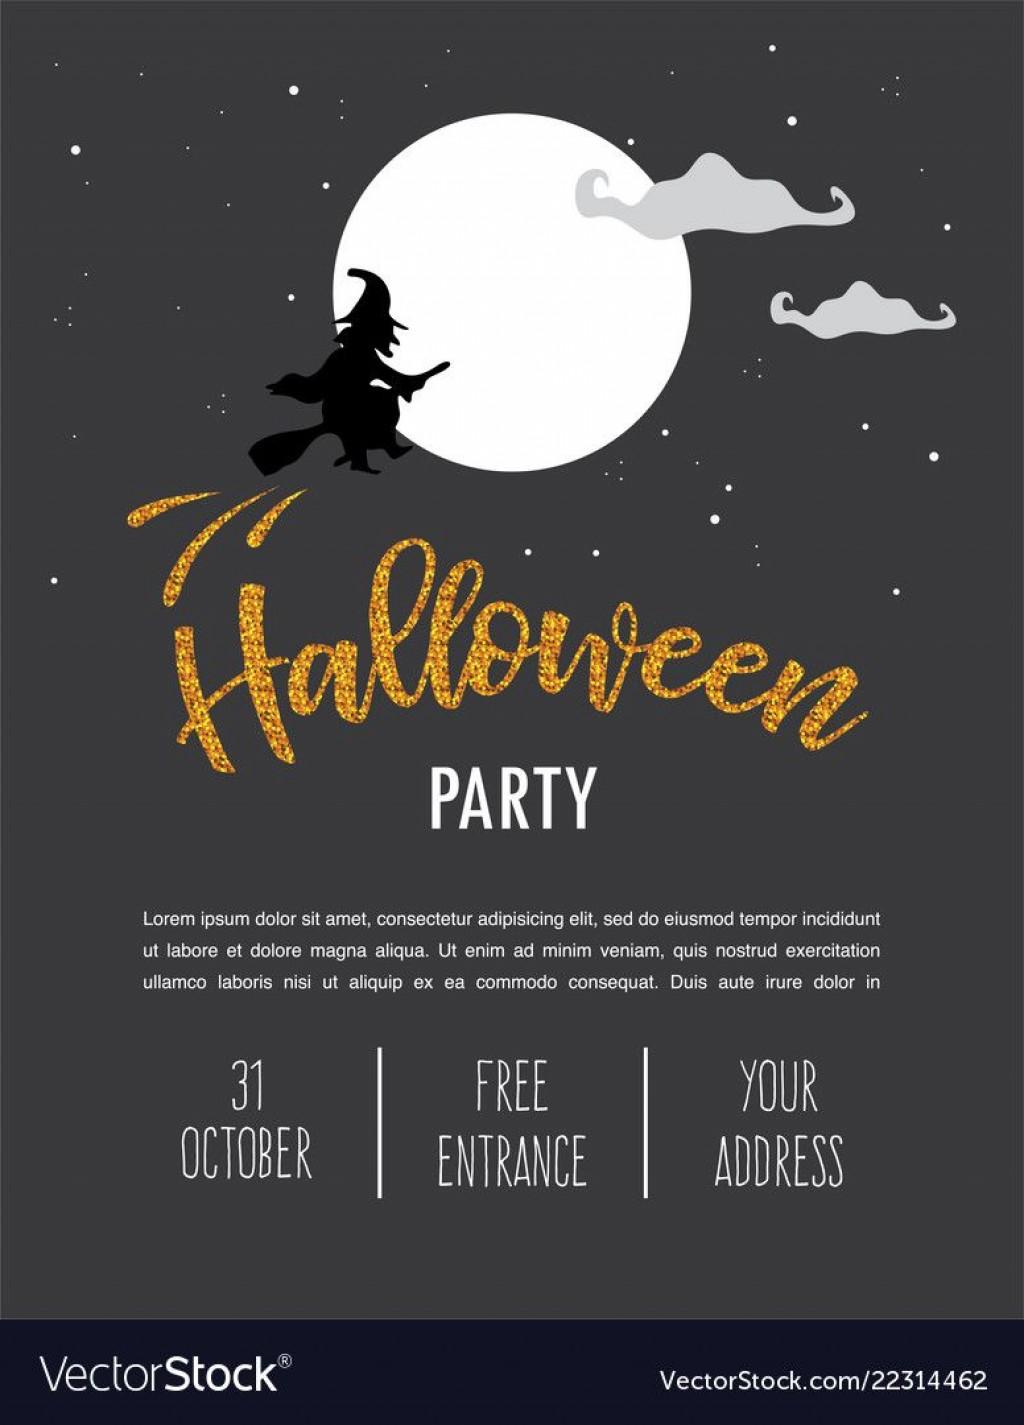 017 Shocking Free Halloween Invitation Template Sample  Templates Microsoft Word Wedding Printable PartyLarge